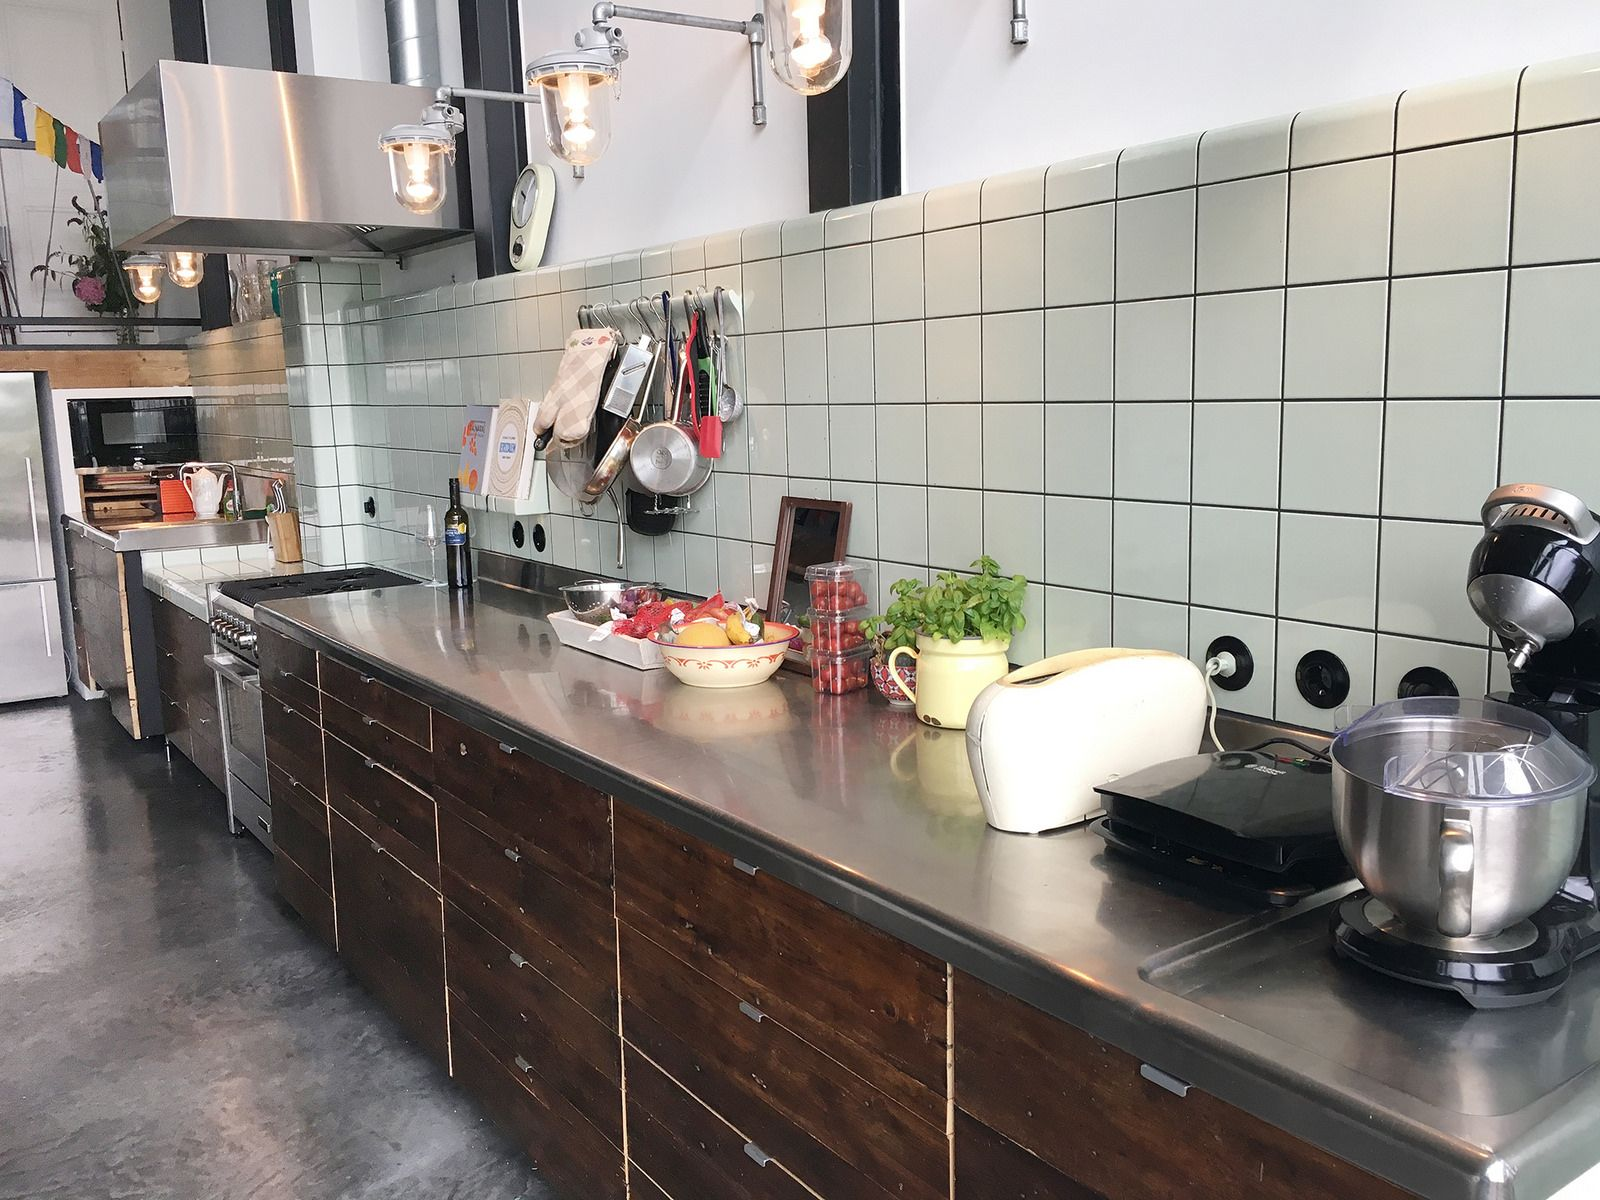 Kleur Keuken Tegels : Dtile kitchen color dew keuken en tegels